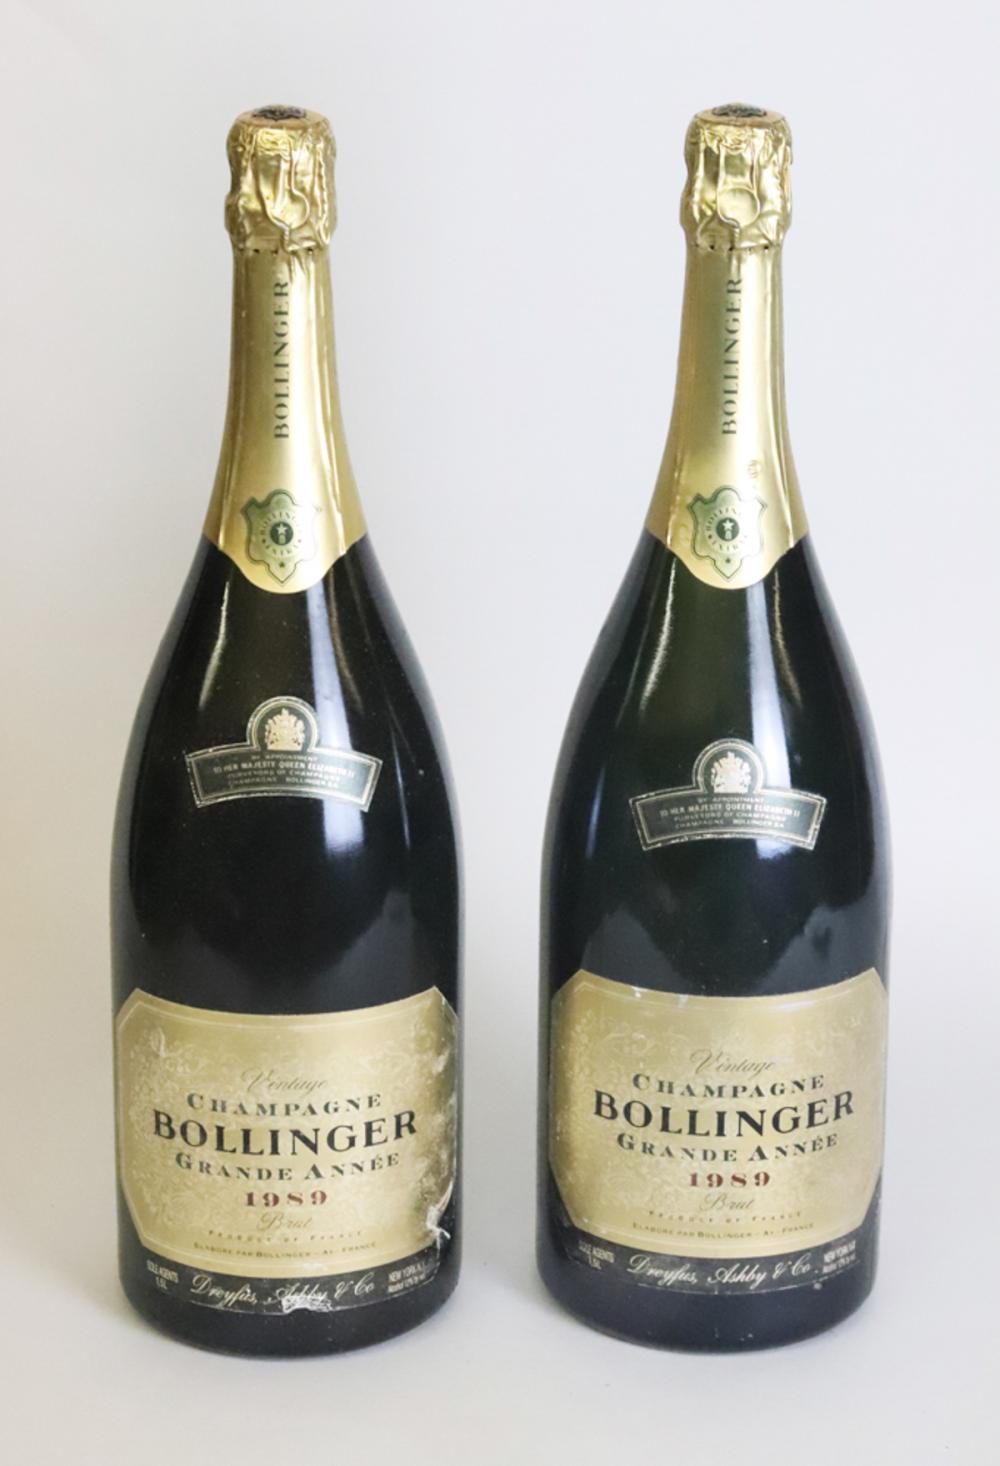 1989 Bollinger La Grande Annee Brut